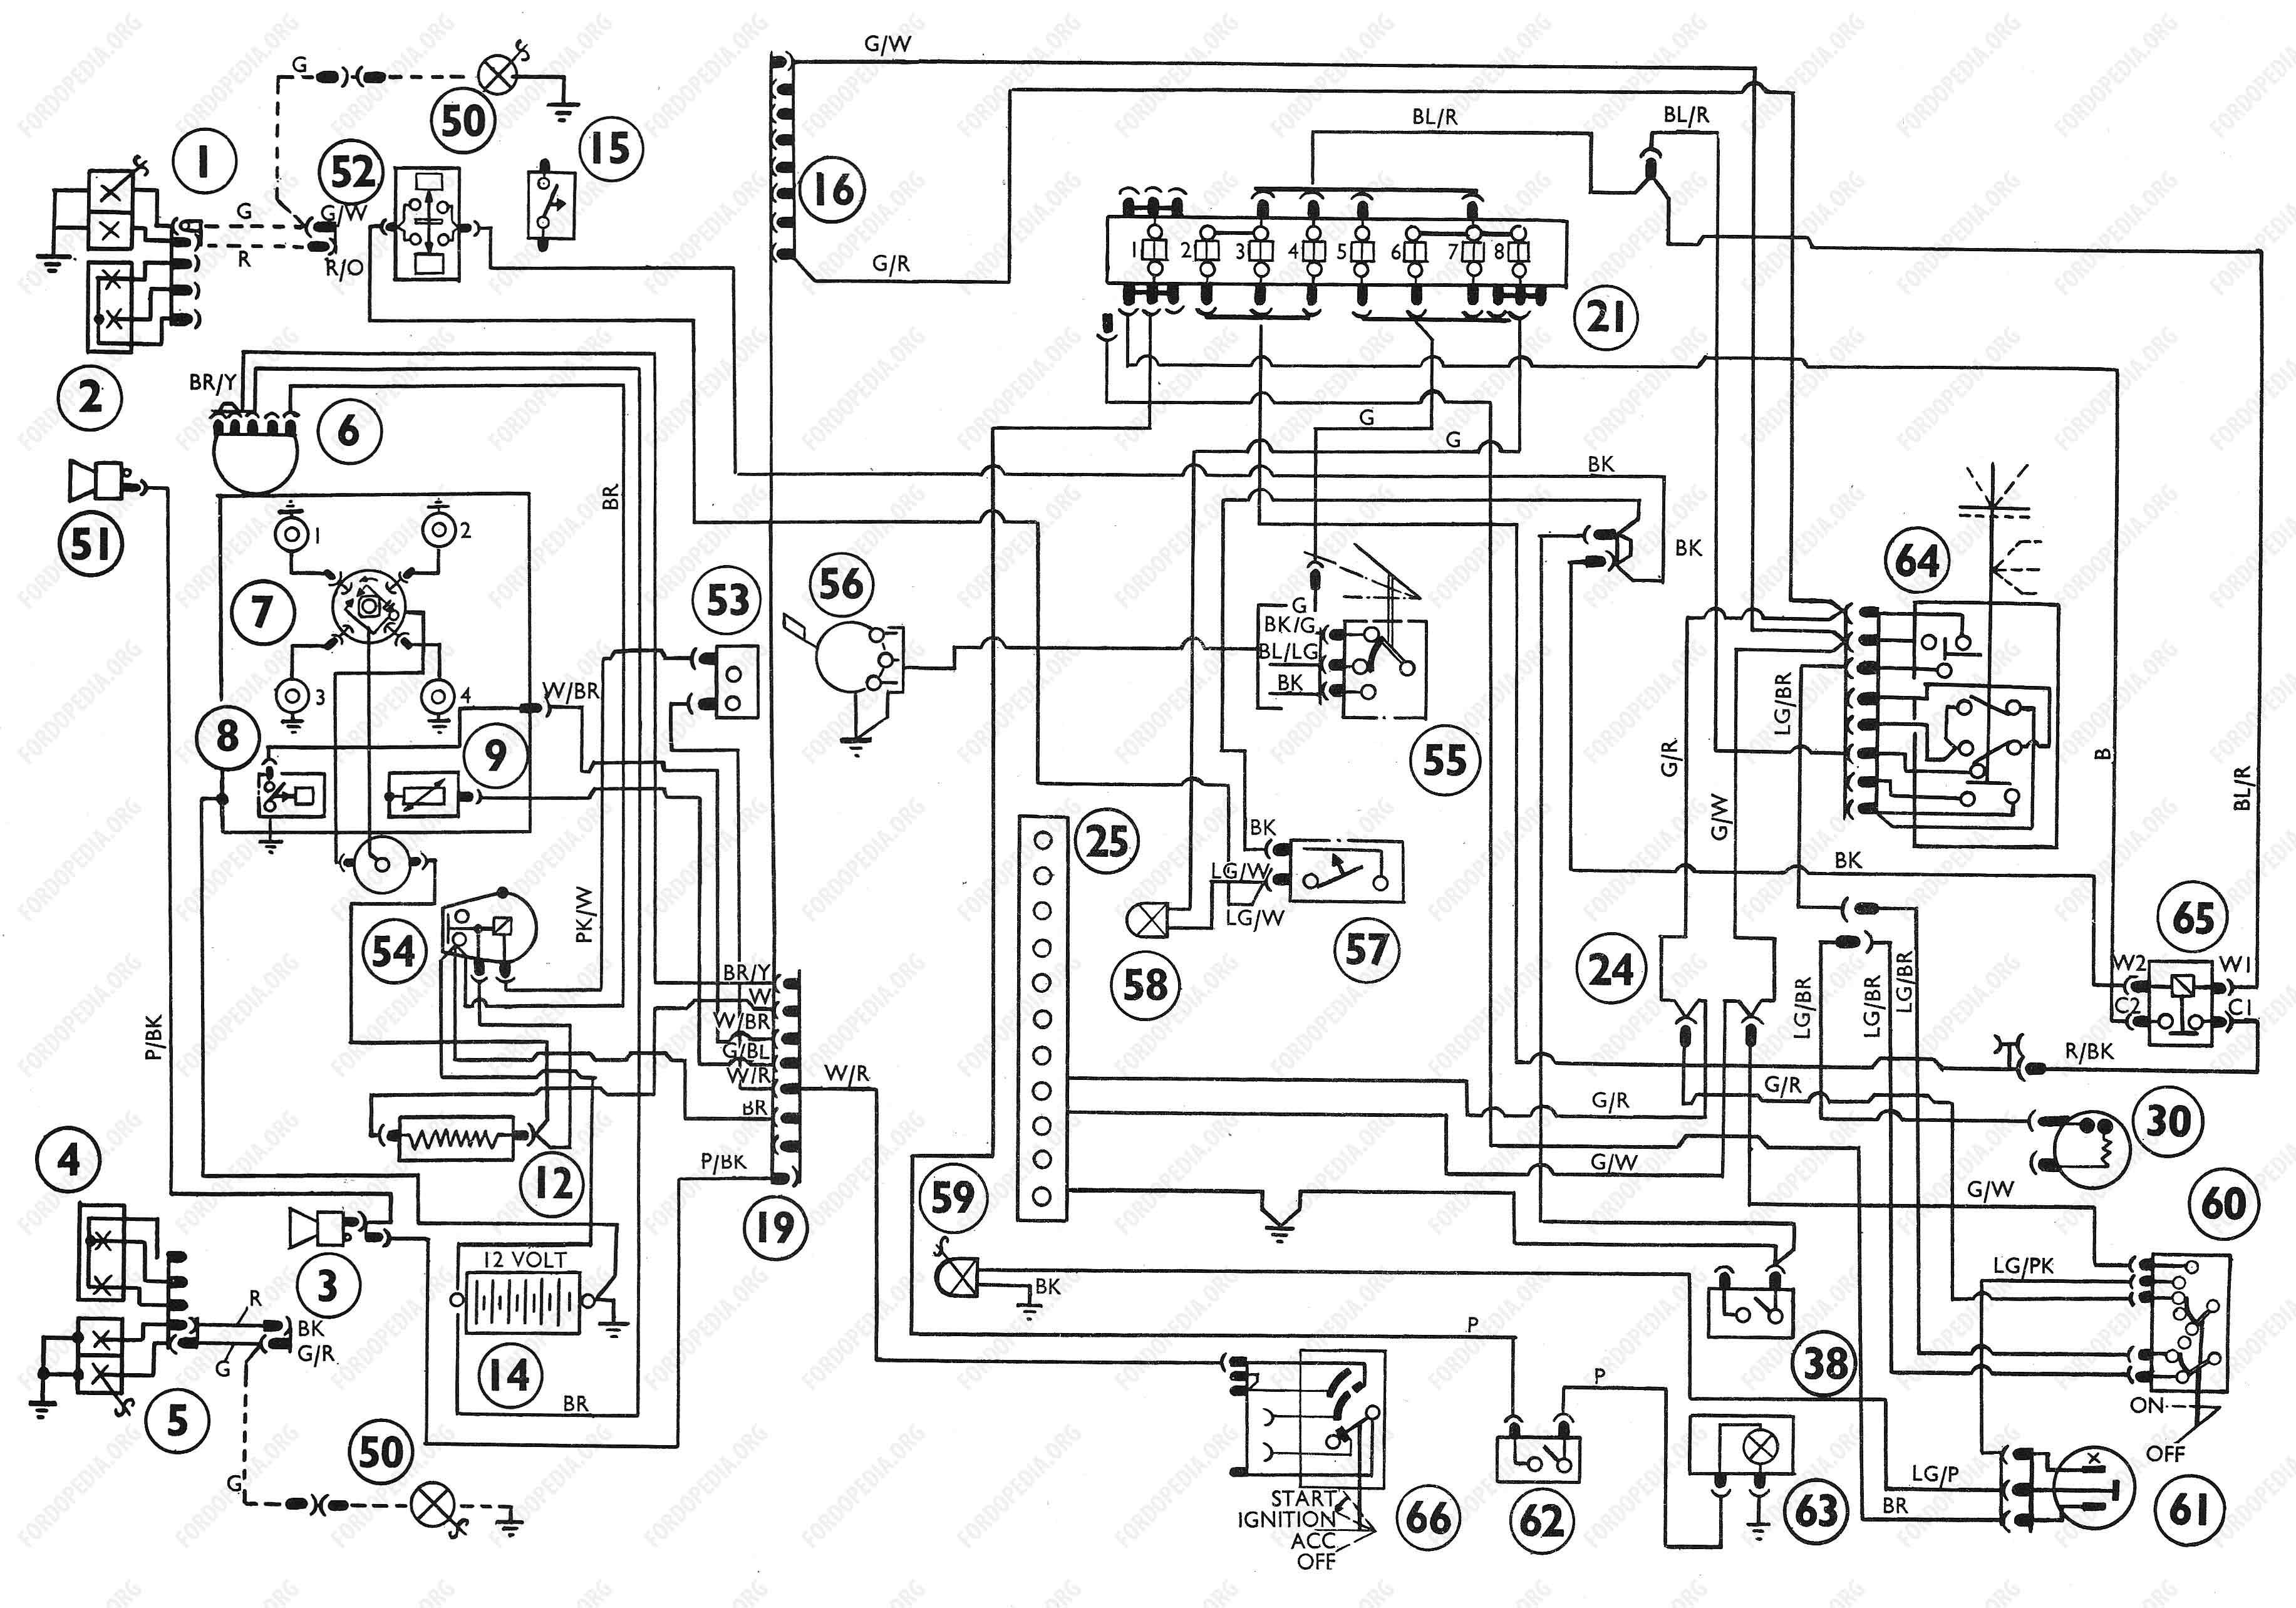 medium resolution of ford bus manuals wiring diagrams pdf bus coach manuals pdf ford transit connect wiring diagram download ford transit connect wiring diagram